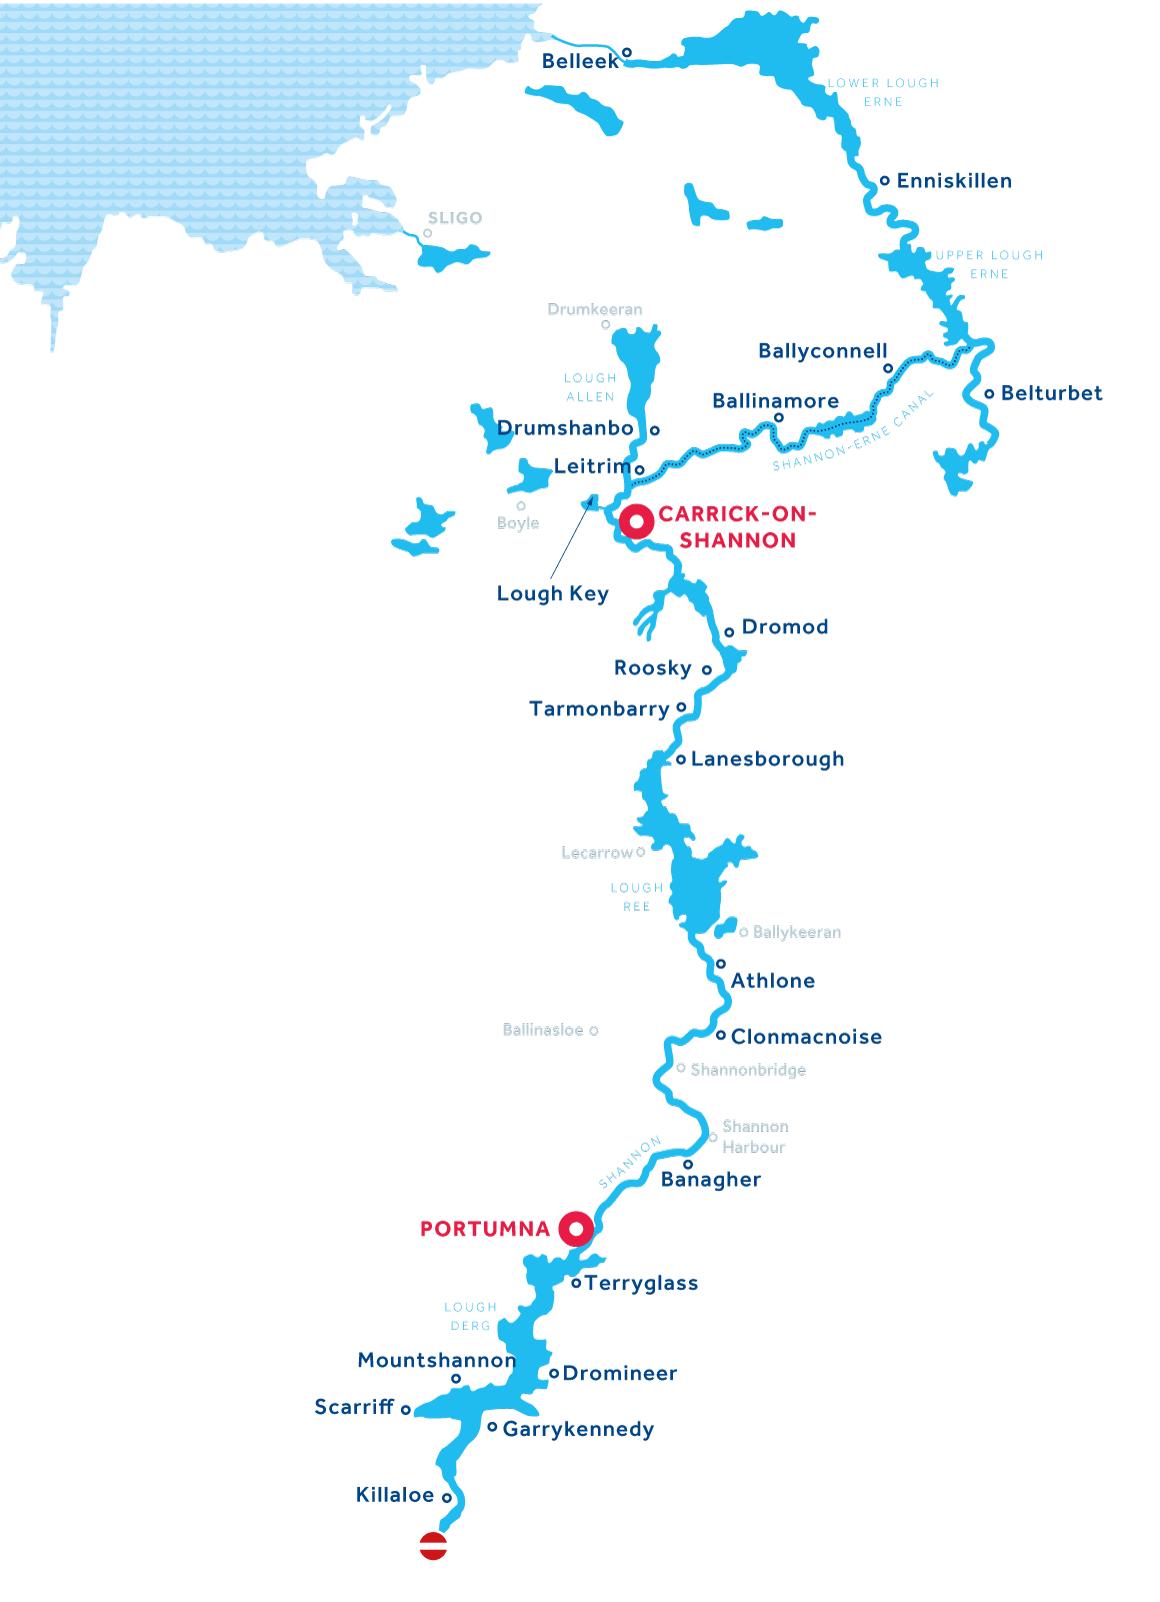 Mappa: Shannon ed Erne